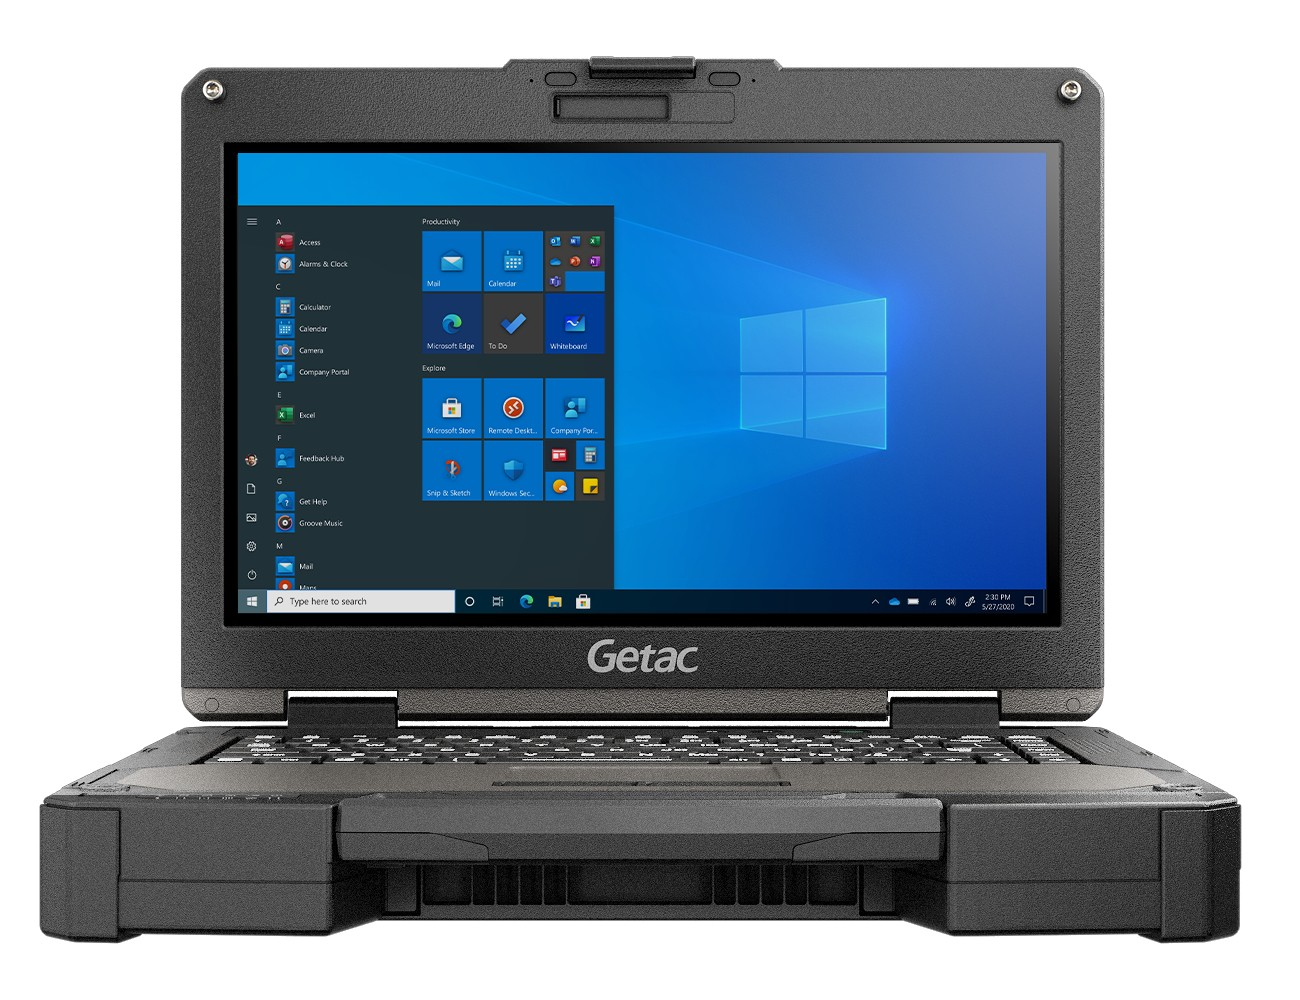 "Getac B360 PRO DDR4-SDRAM Notebook 33,8 cm (13.3"") 1920 x 1080 Pixels Touchscreen Intel® 10de generatie Core™ i5 8 GB 256 GB SSD NVIDIA® GeForce® GTX 1050 Wi-Fi 6 (802.11ax) Windows 10 Pro Zwart"